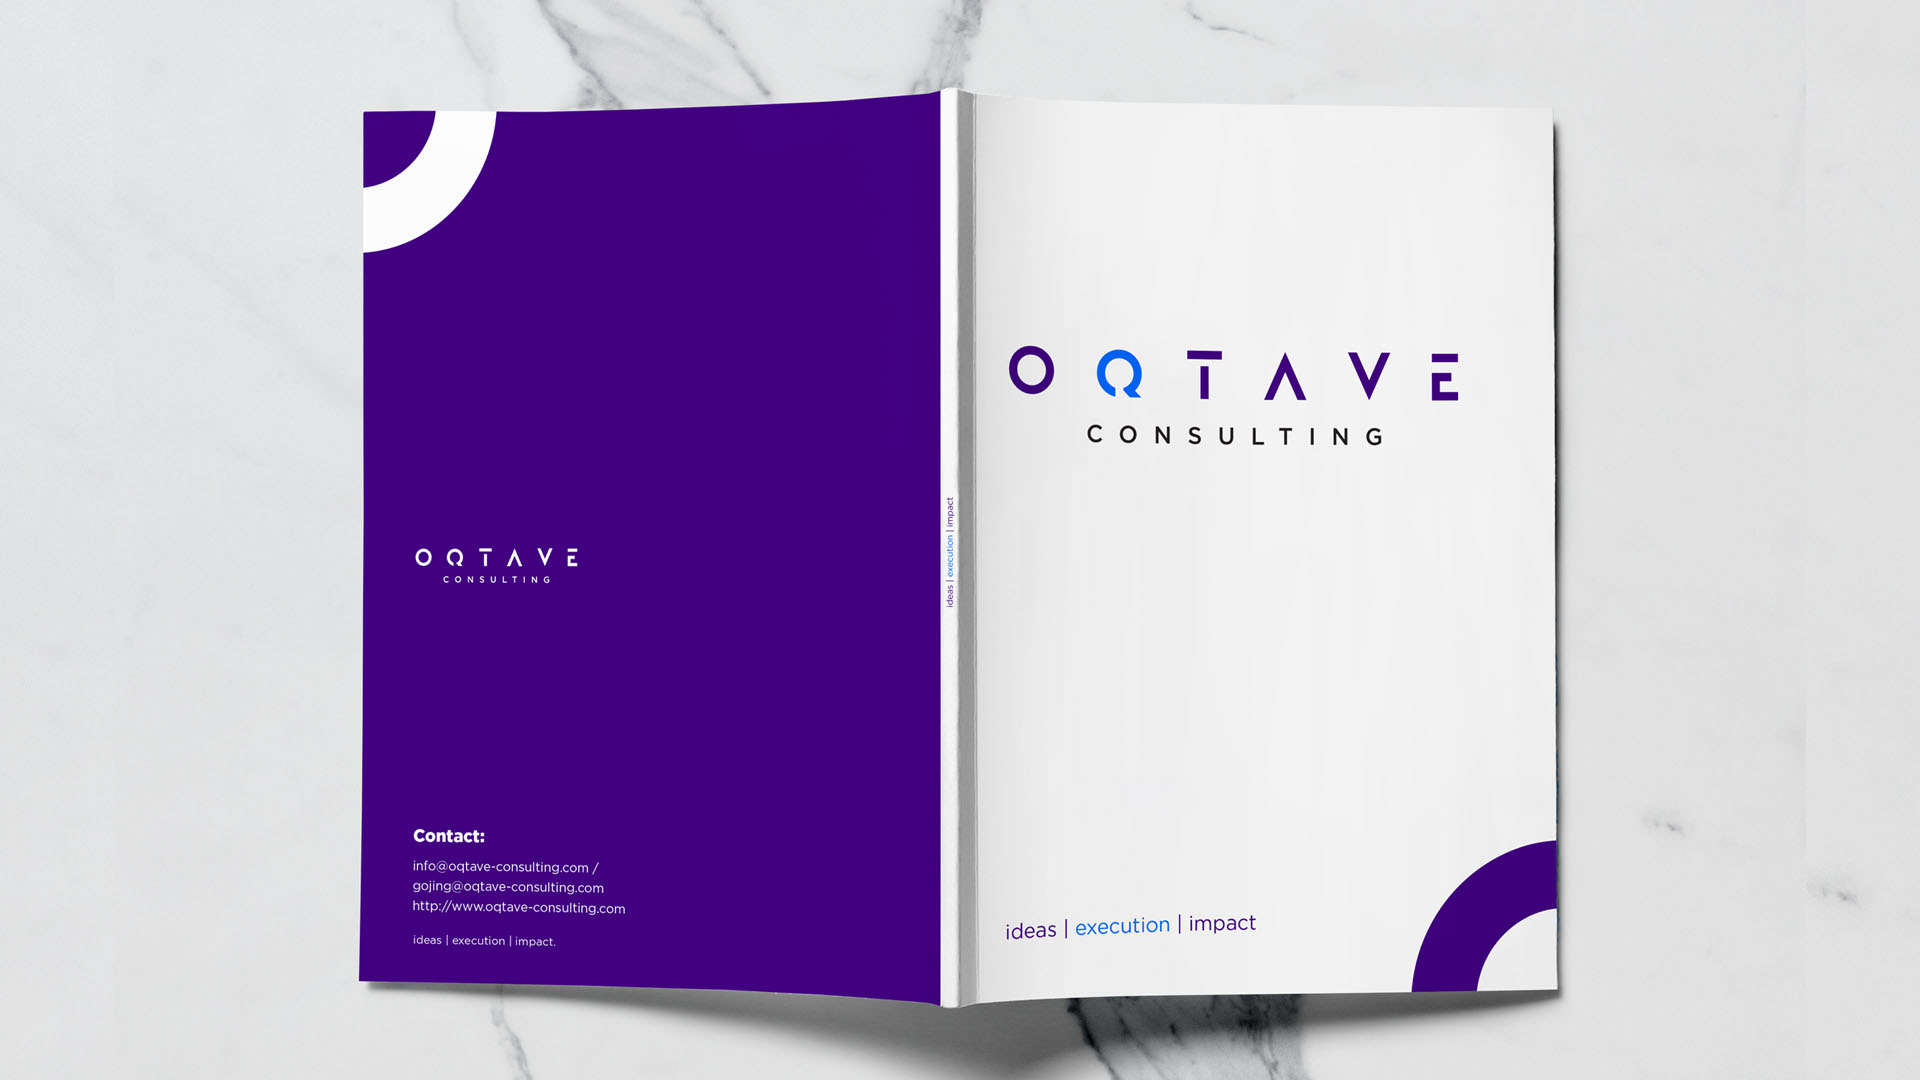 Oqtave Consulting Profile Deigned by Jabari Creative Studios